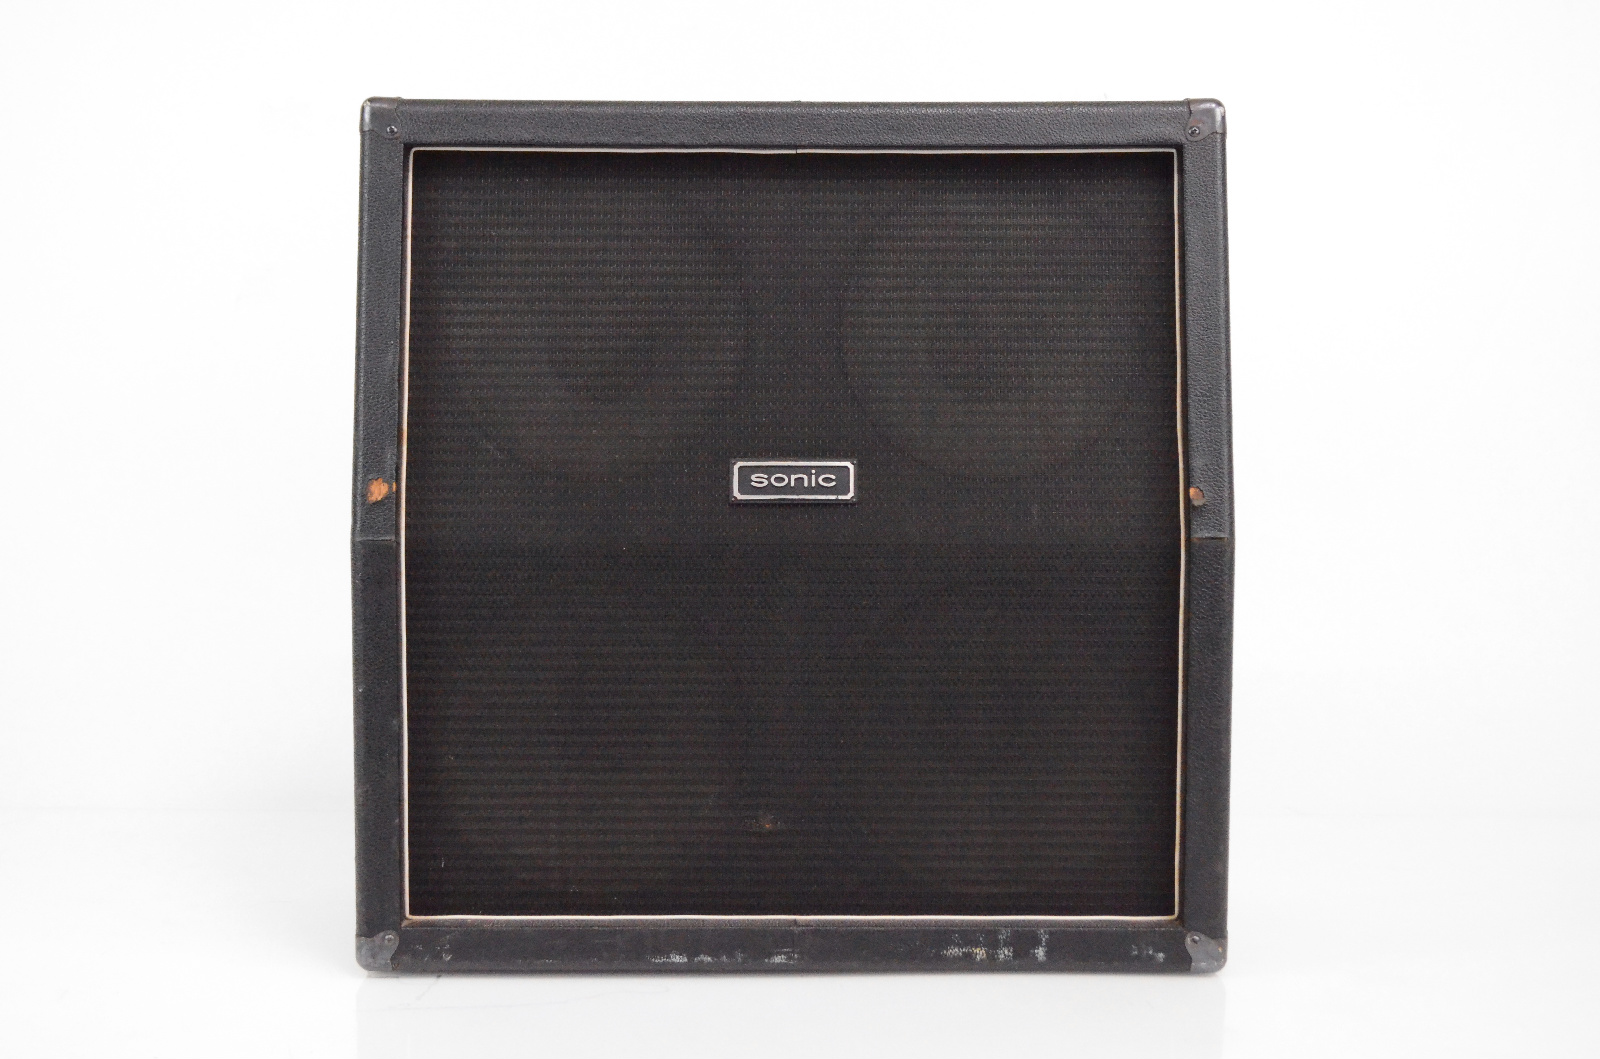 Sonic 4x12 16 Ohm Guitar Slant Speaker Cabinet w/ Cover Celestion G12-30 #32478